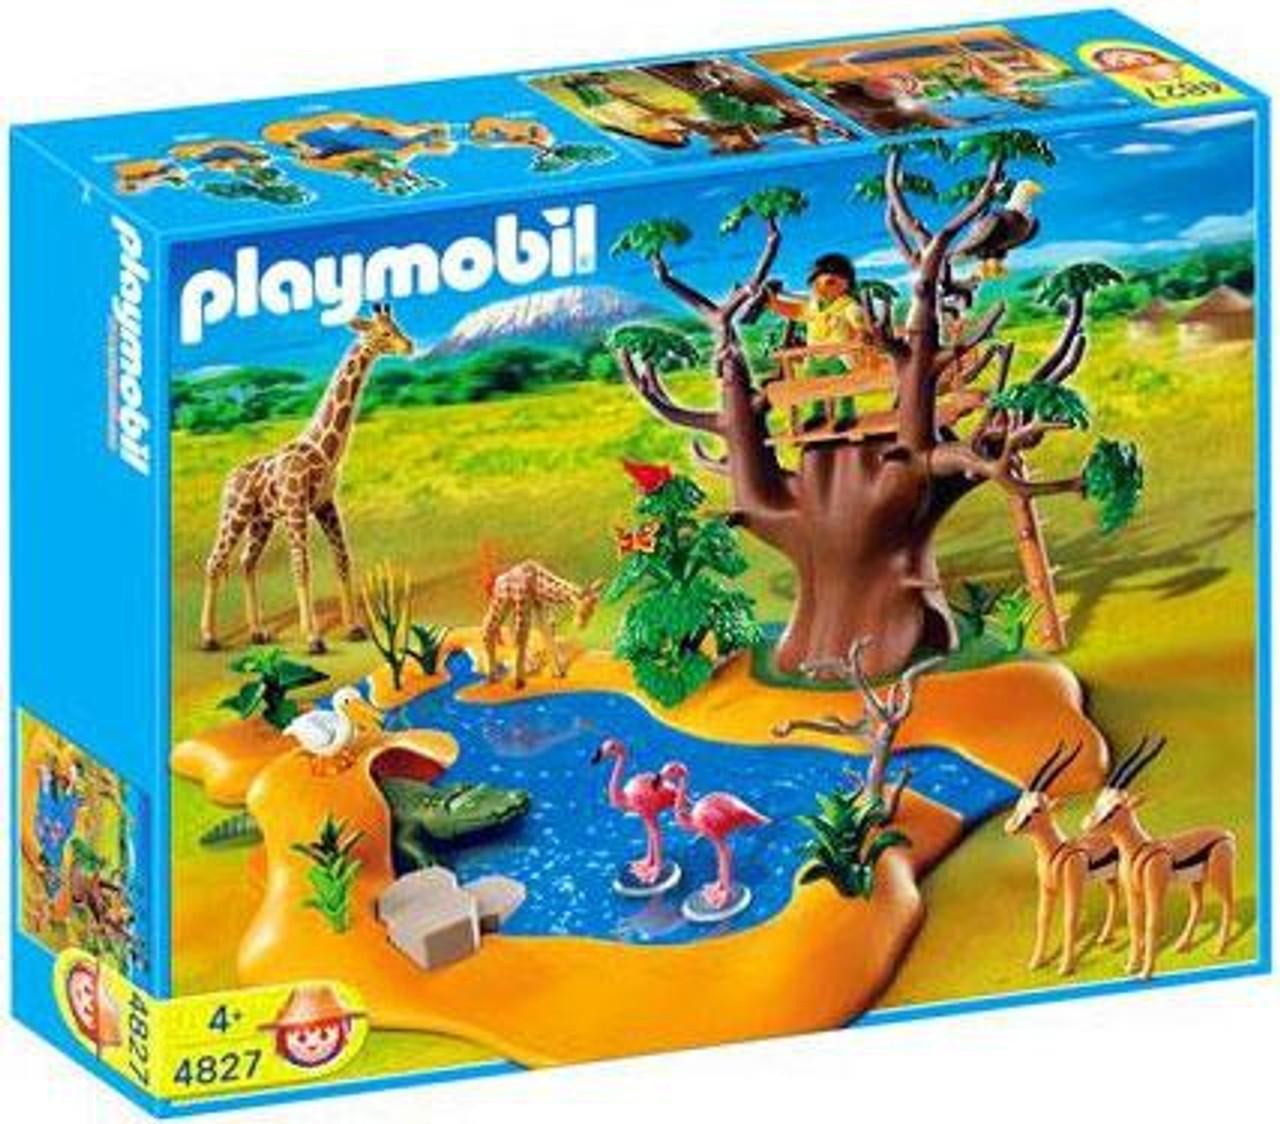 playmobil zoo african wildlife wild life waterhole set 4827 toywiz. Black Bedroom Furniture Sets. Home Design Ideas